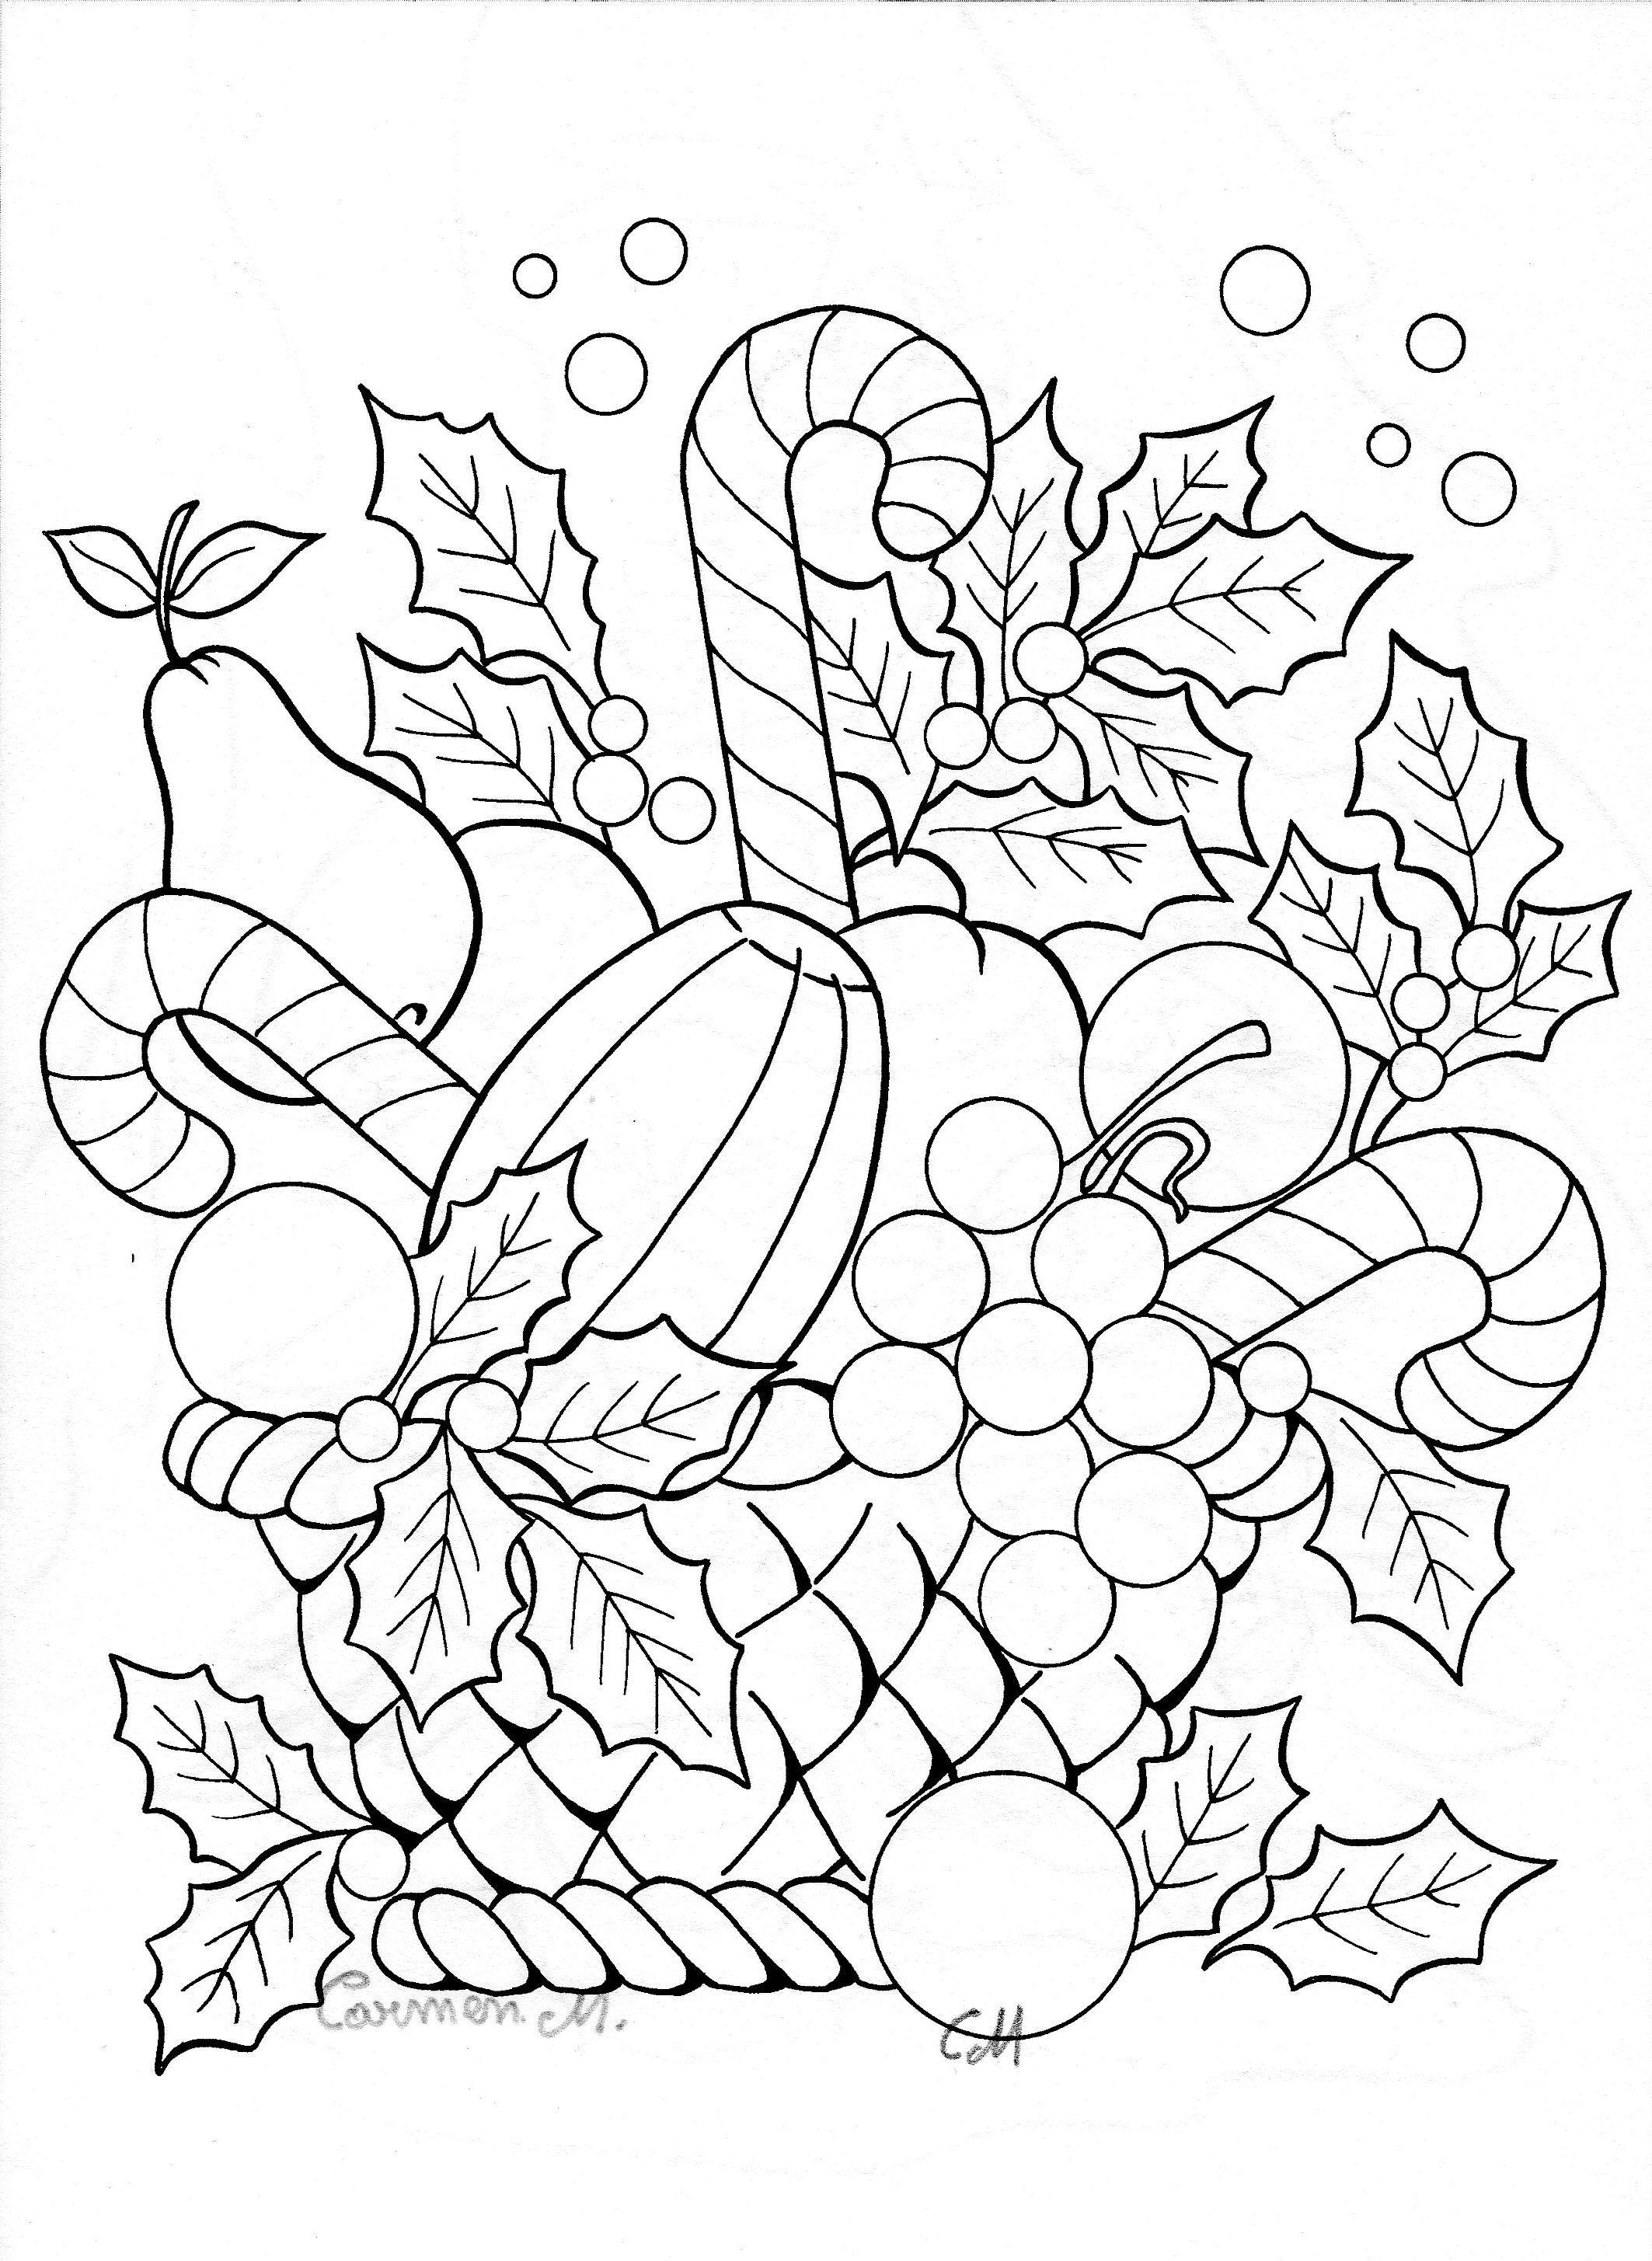 Pin de Neus Gómez Frias en Dibuixos Nadal | Pinterest | Pinturas